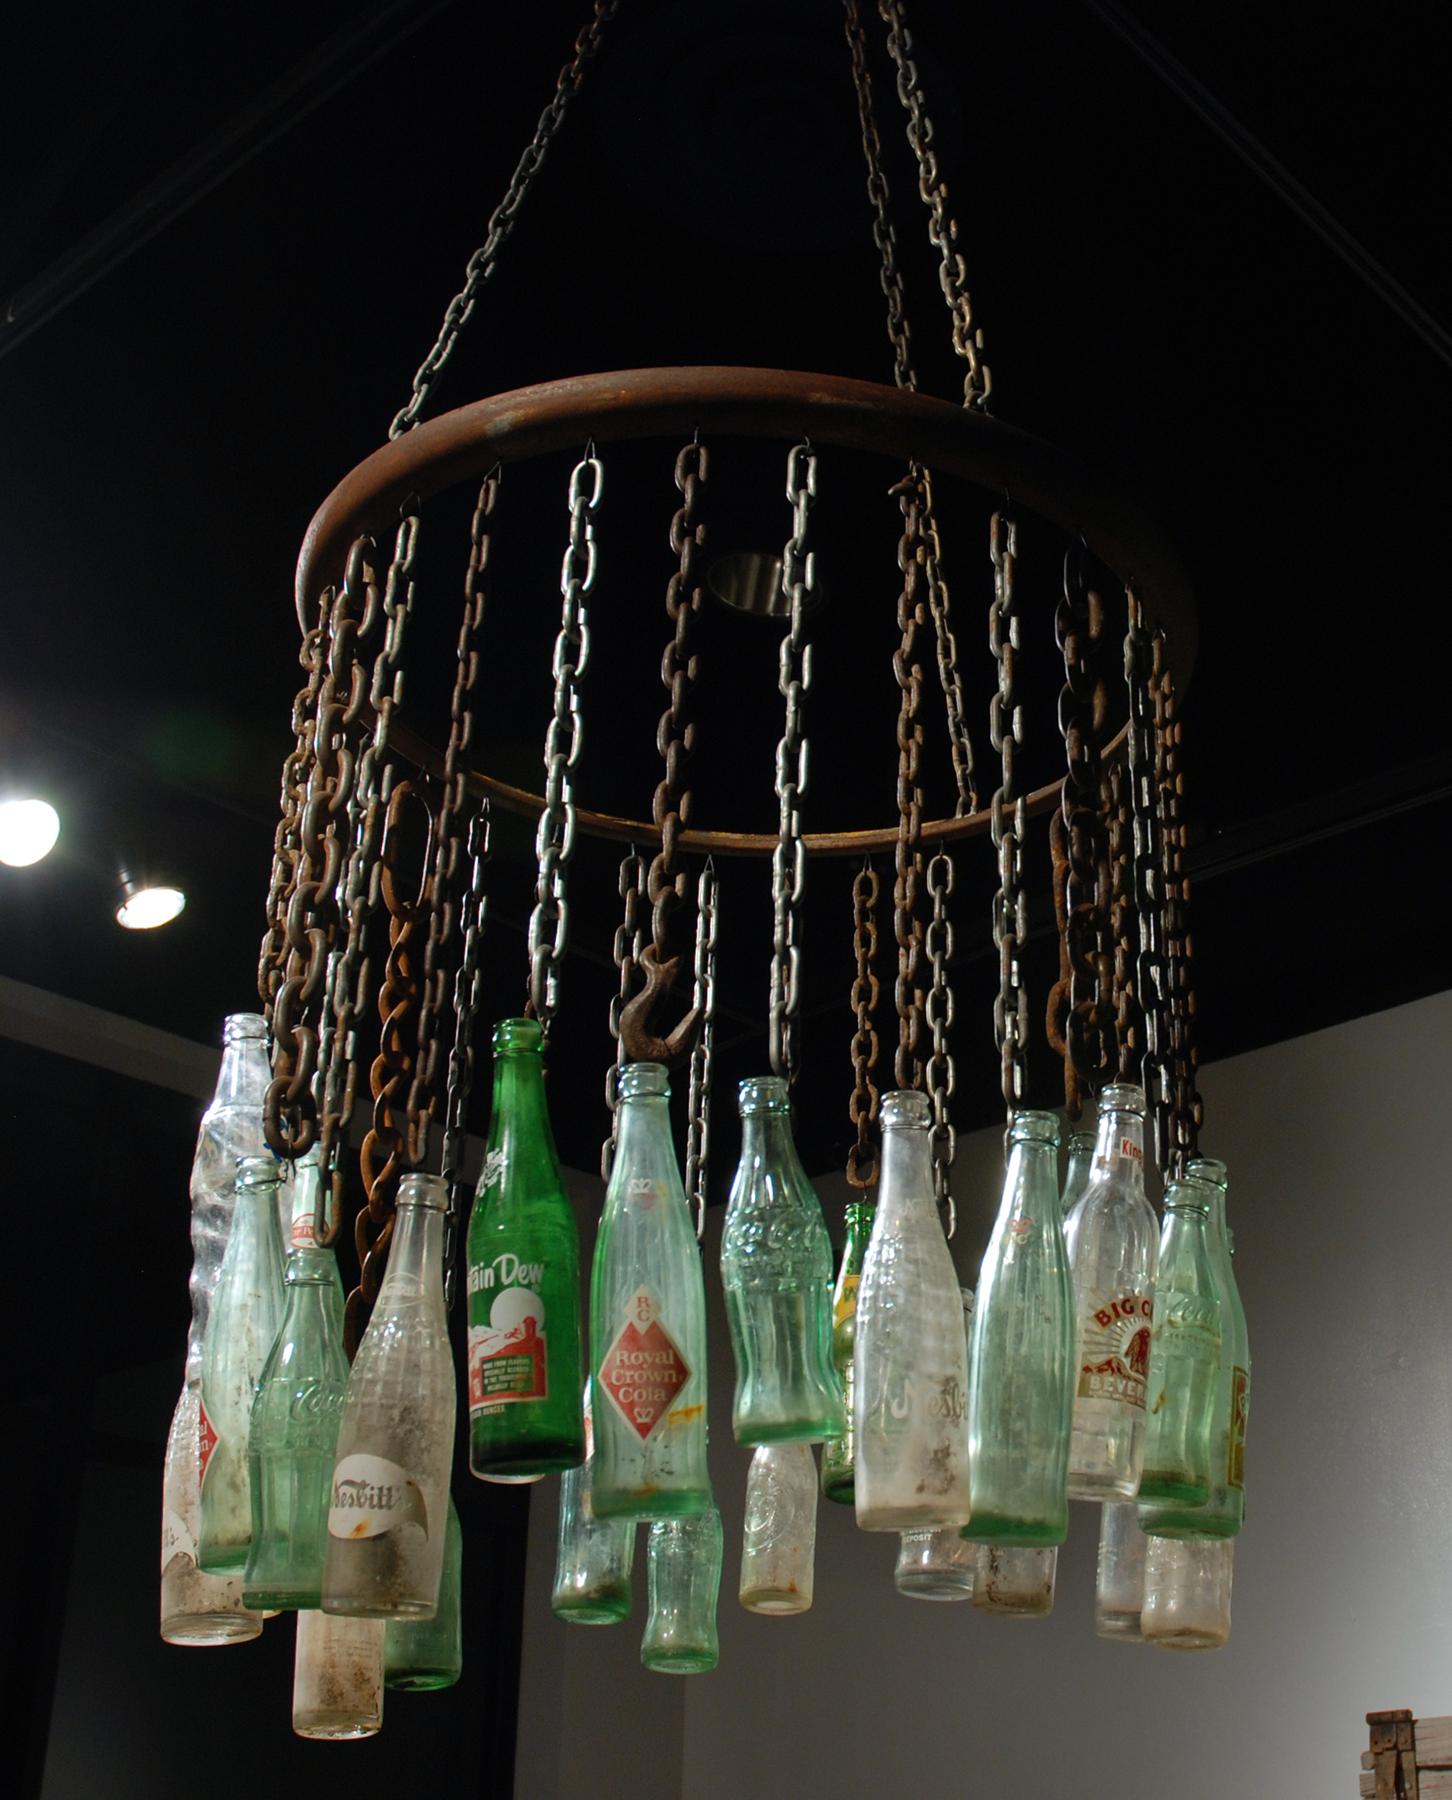 rachel manera - lámpara de araña